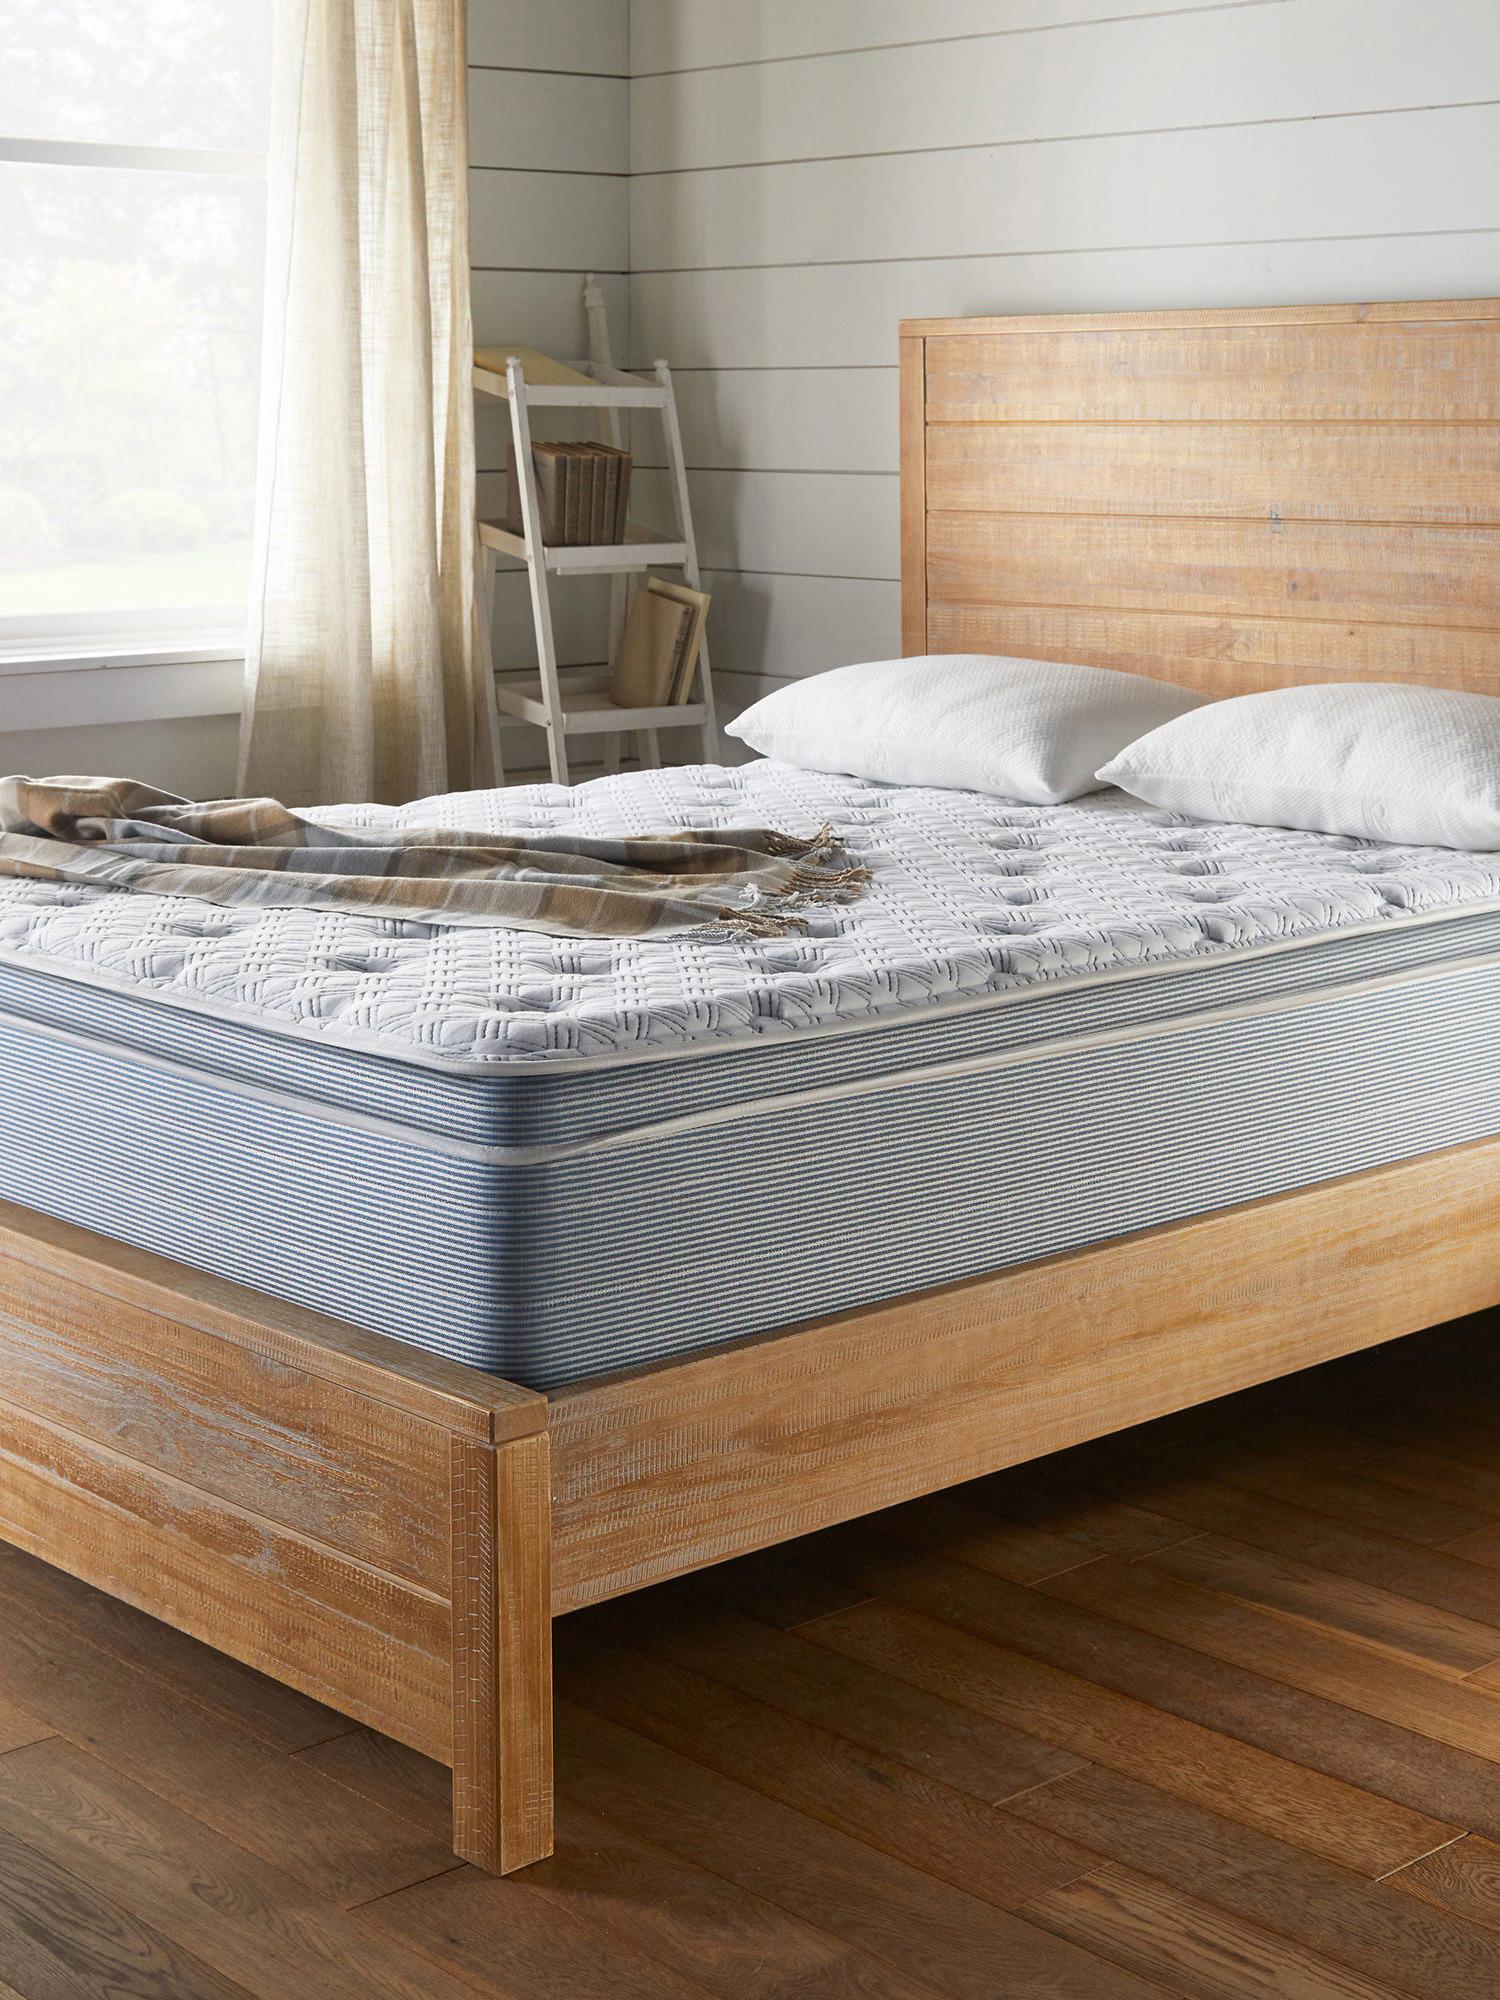 《Corsicana》2020秋冬床垫系列Lookbook